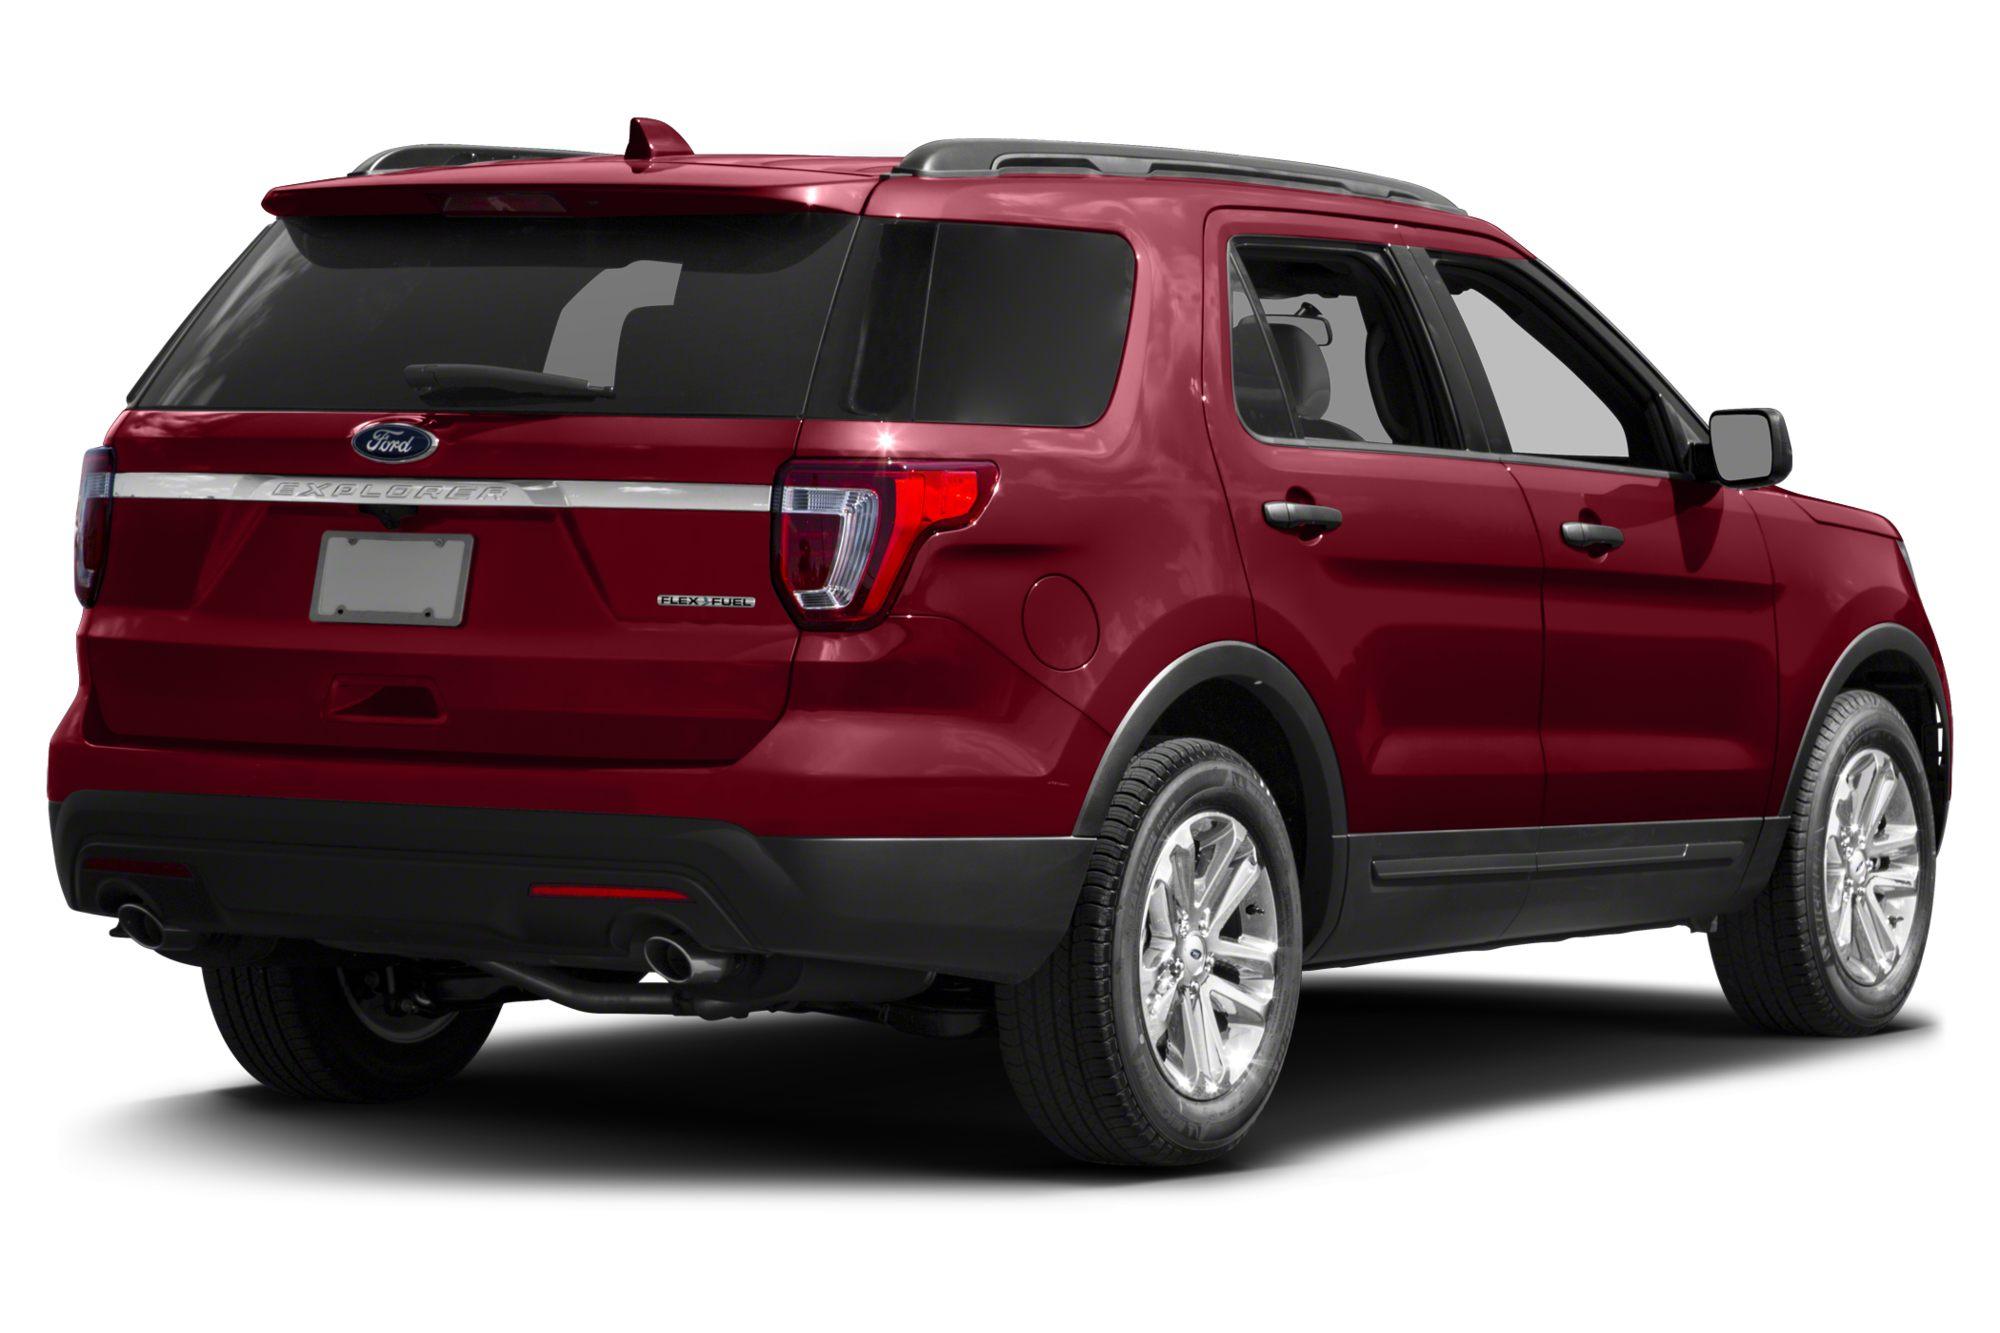 ford-explorer-2016-exterior-rear-three-quarter-oem